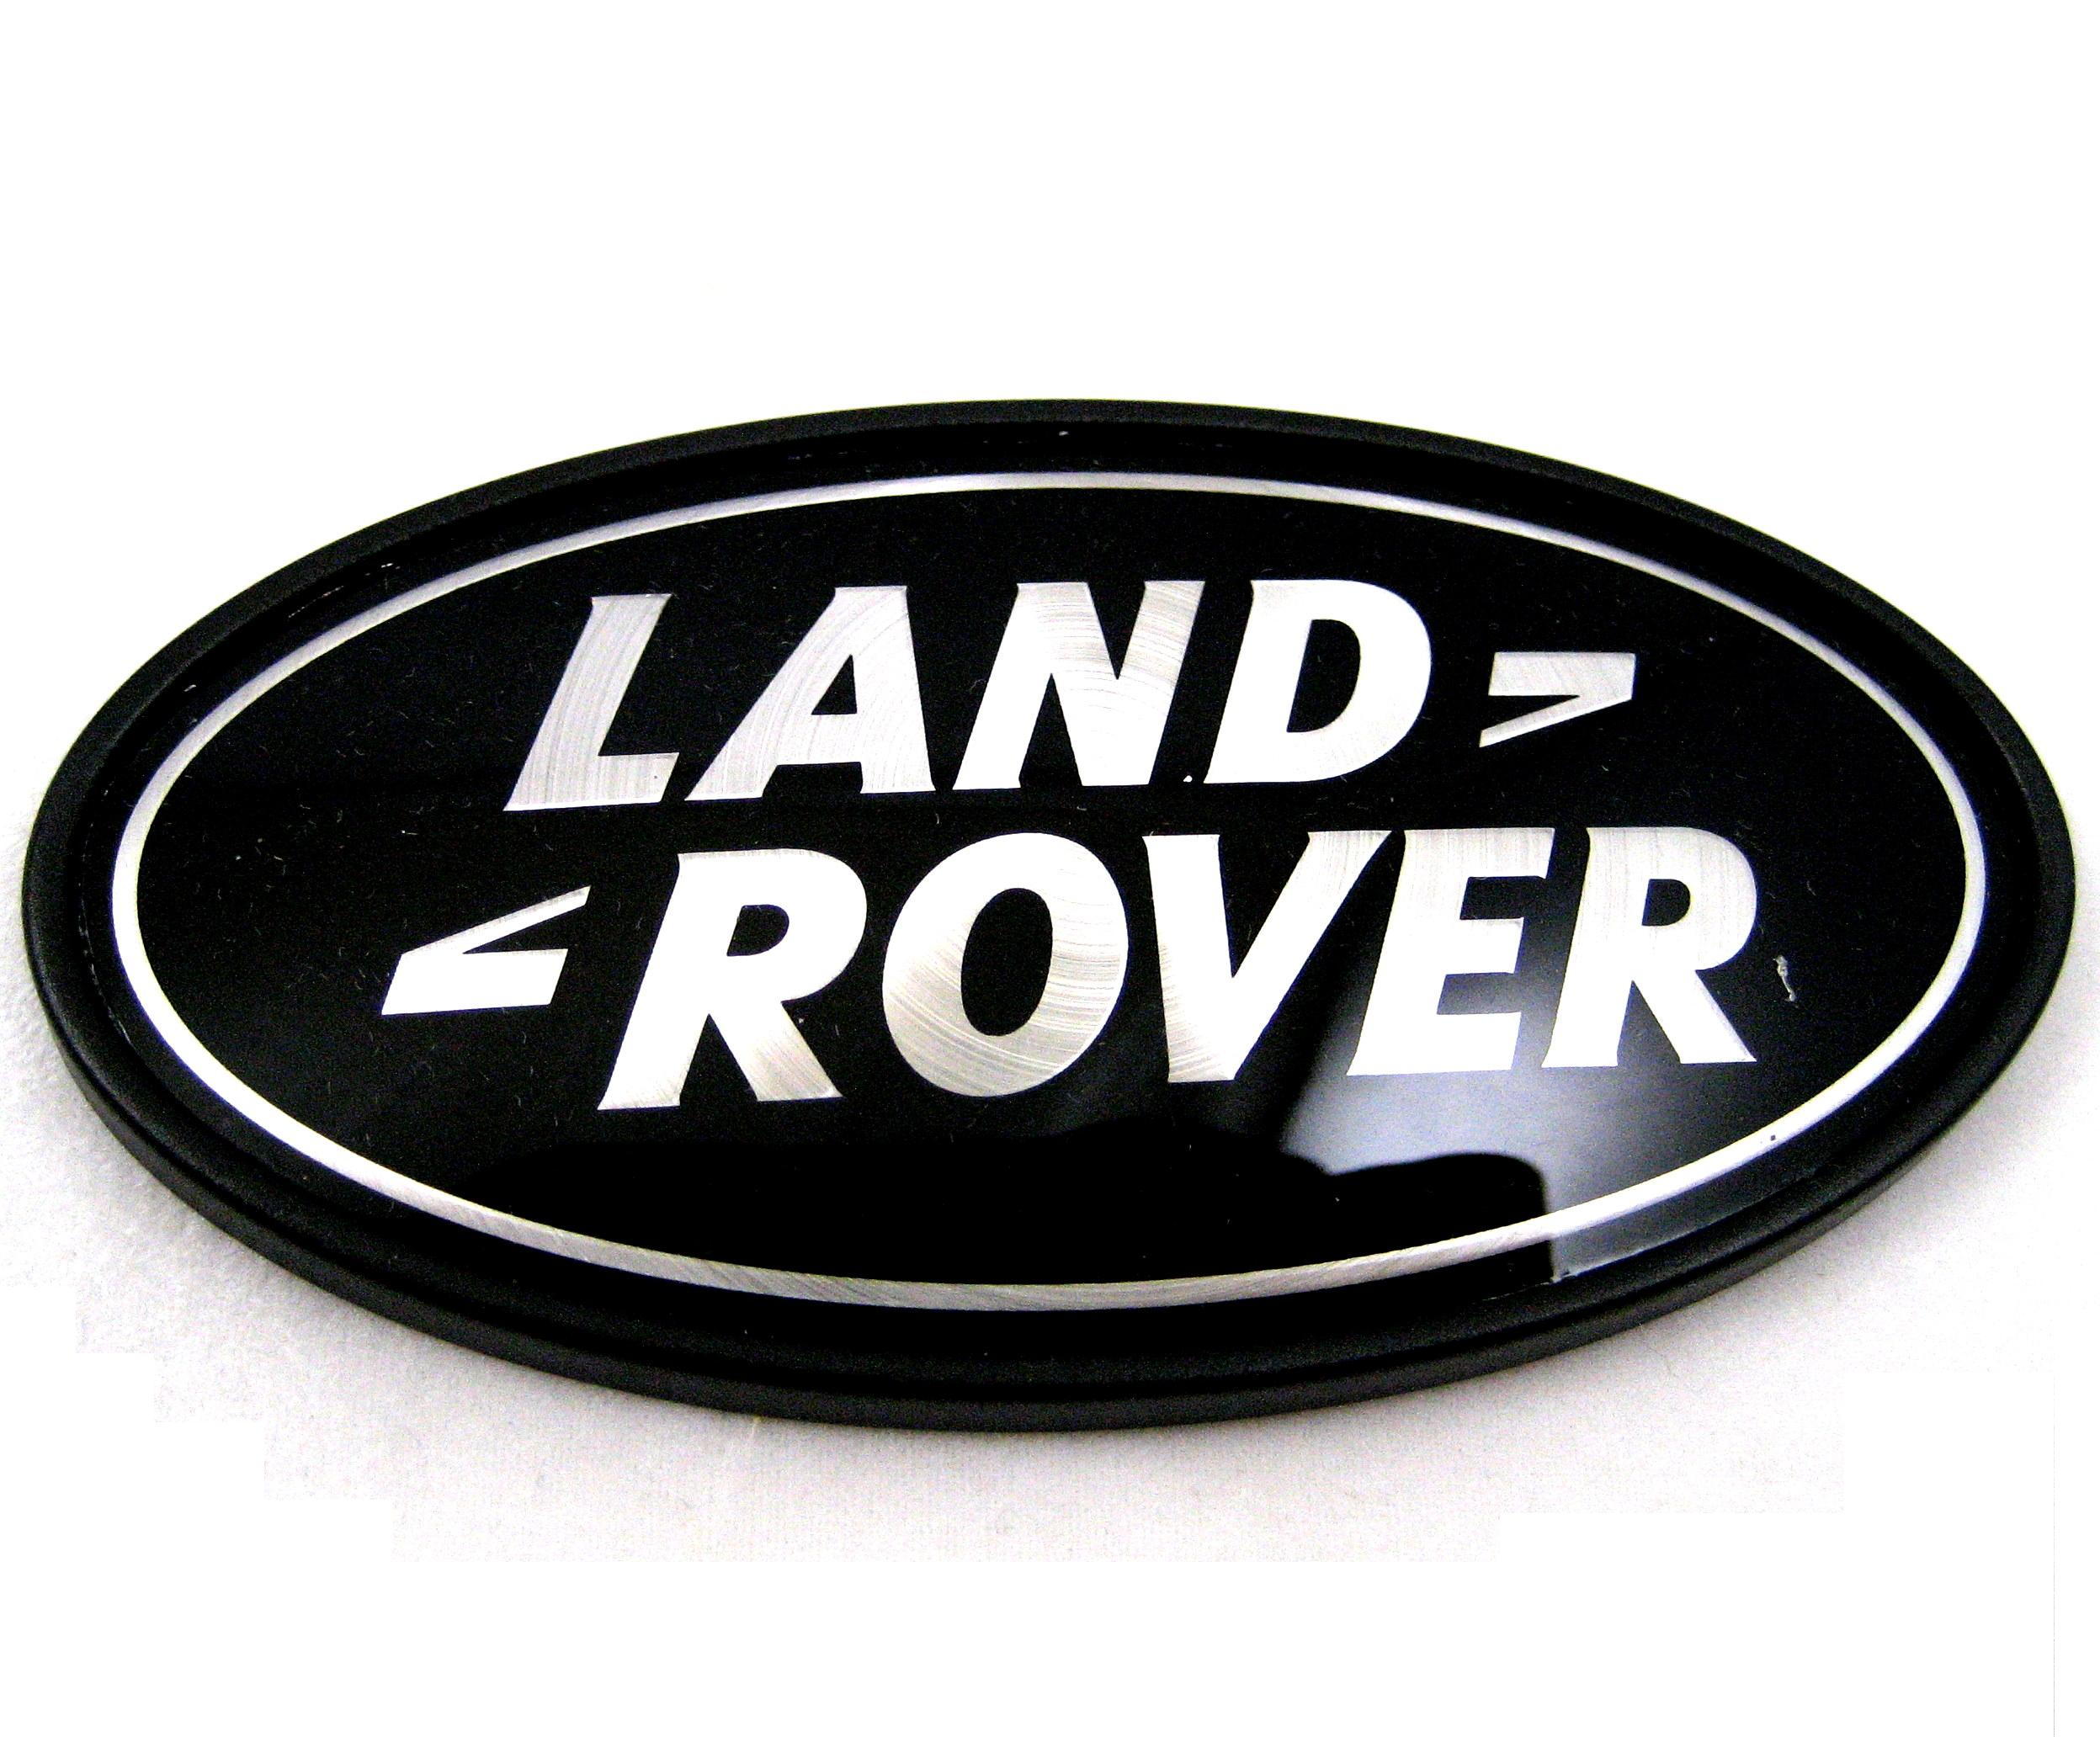 Range Rover Logo Vector >> Land Rover Freelander 1 black+Silver oval rear badge upgrade TD4 diesel 3 5 door   eBay